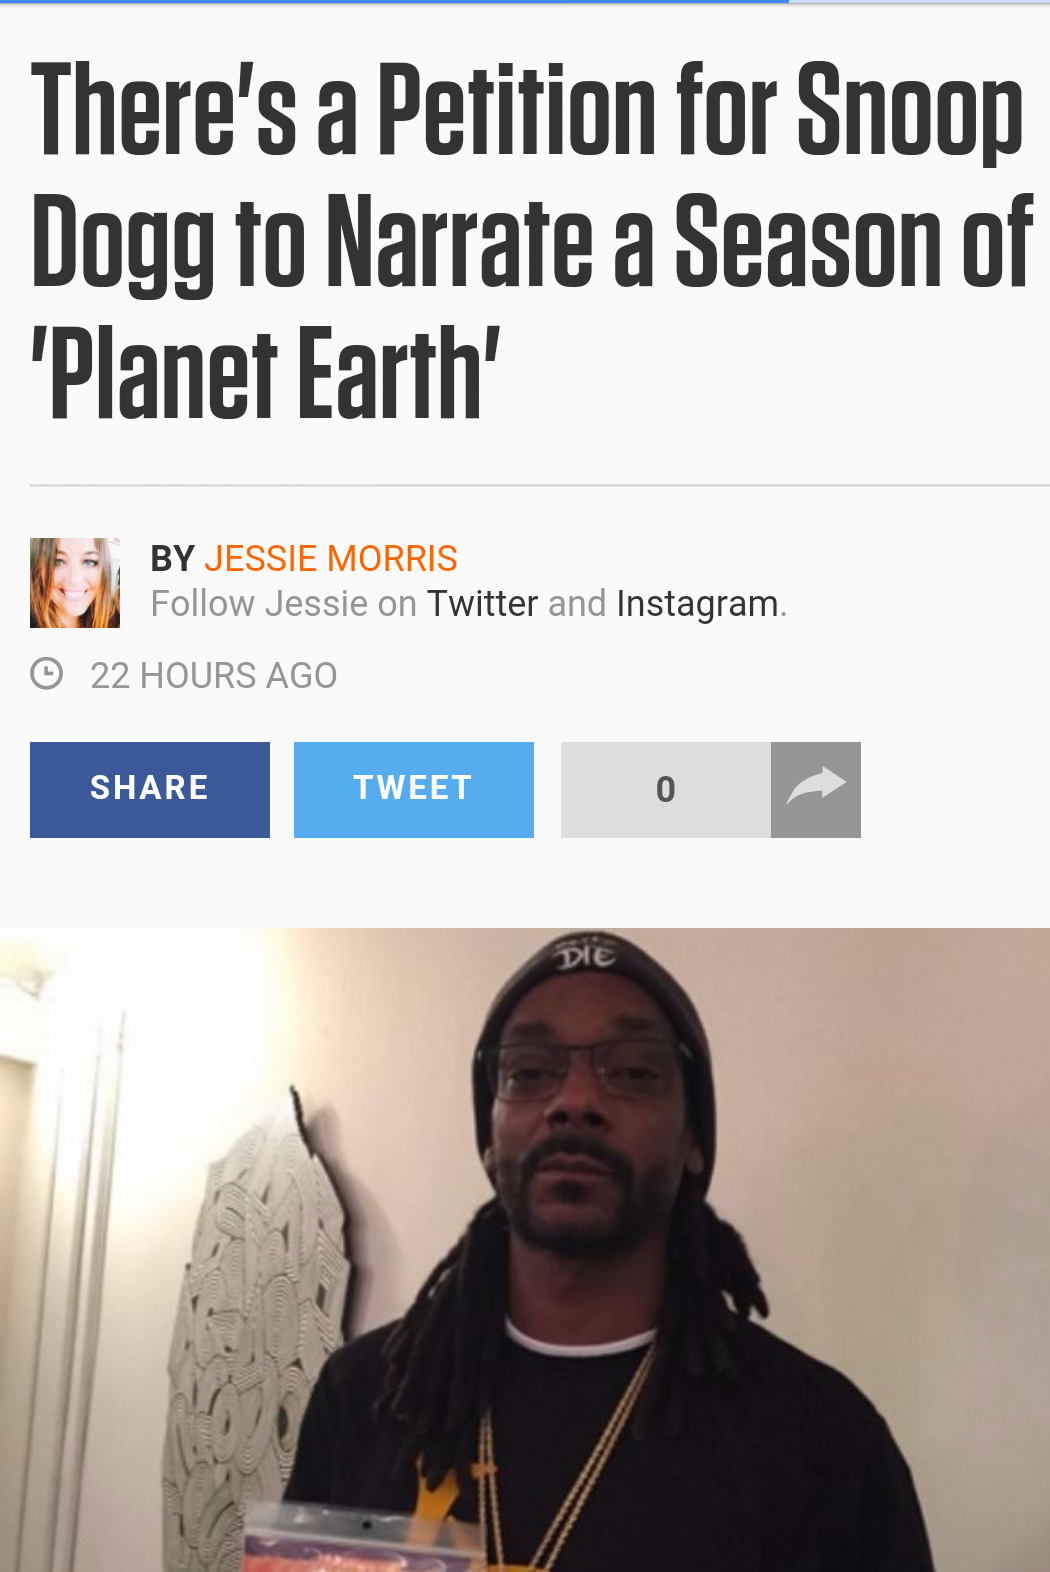 Plizzanet Earth - meme